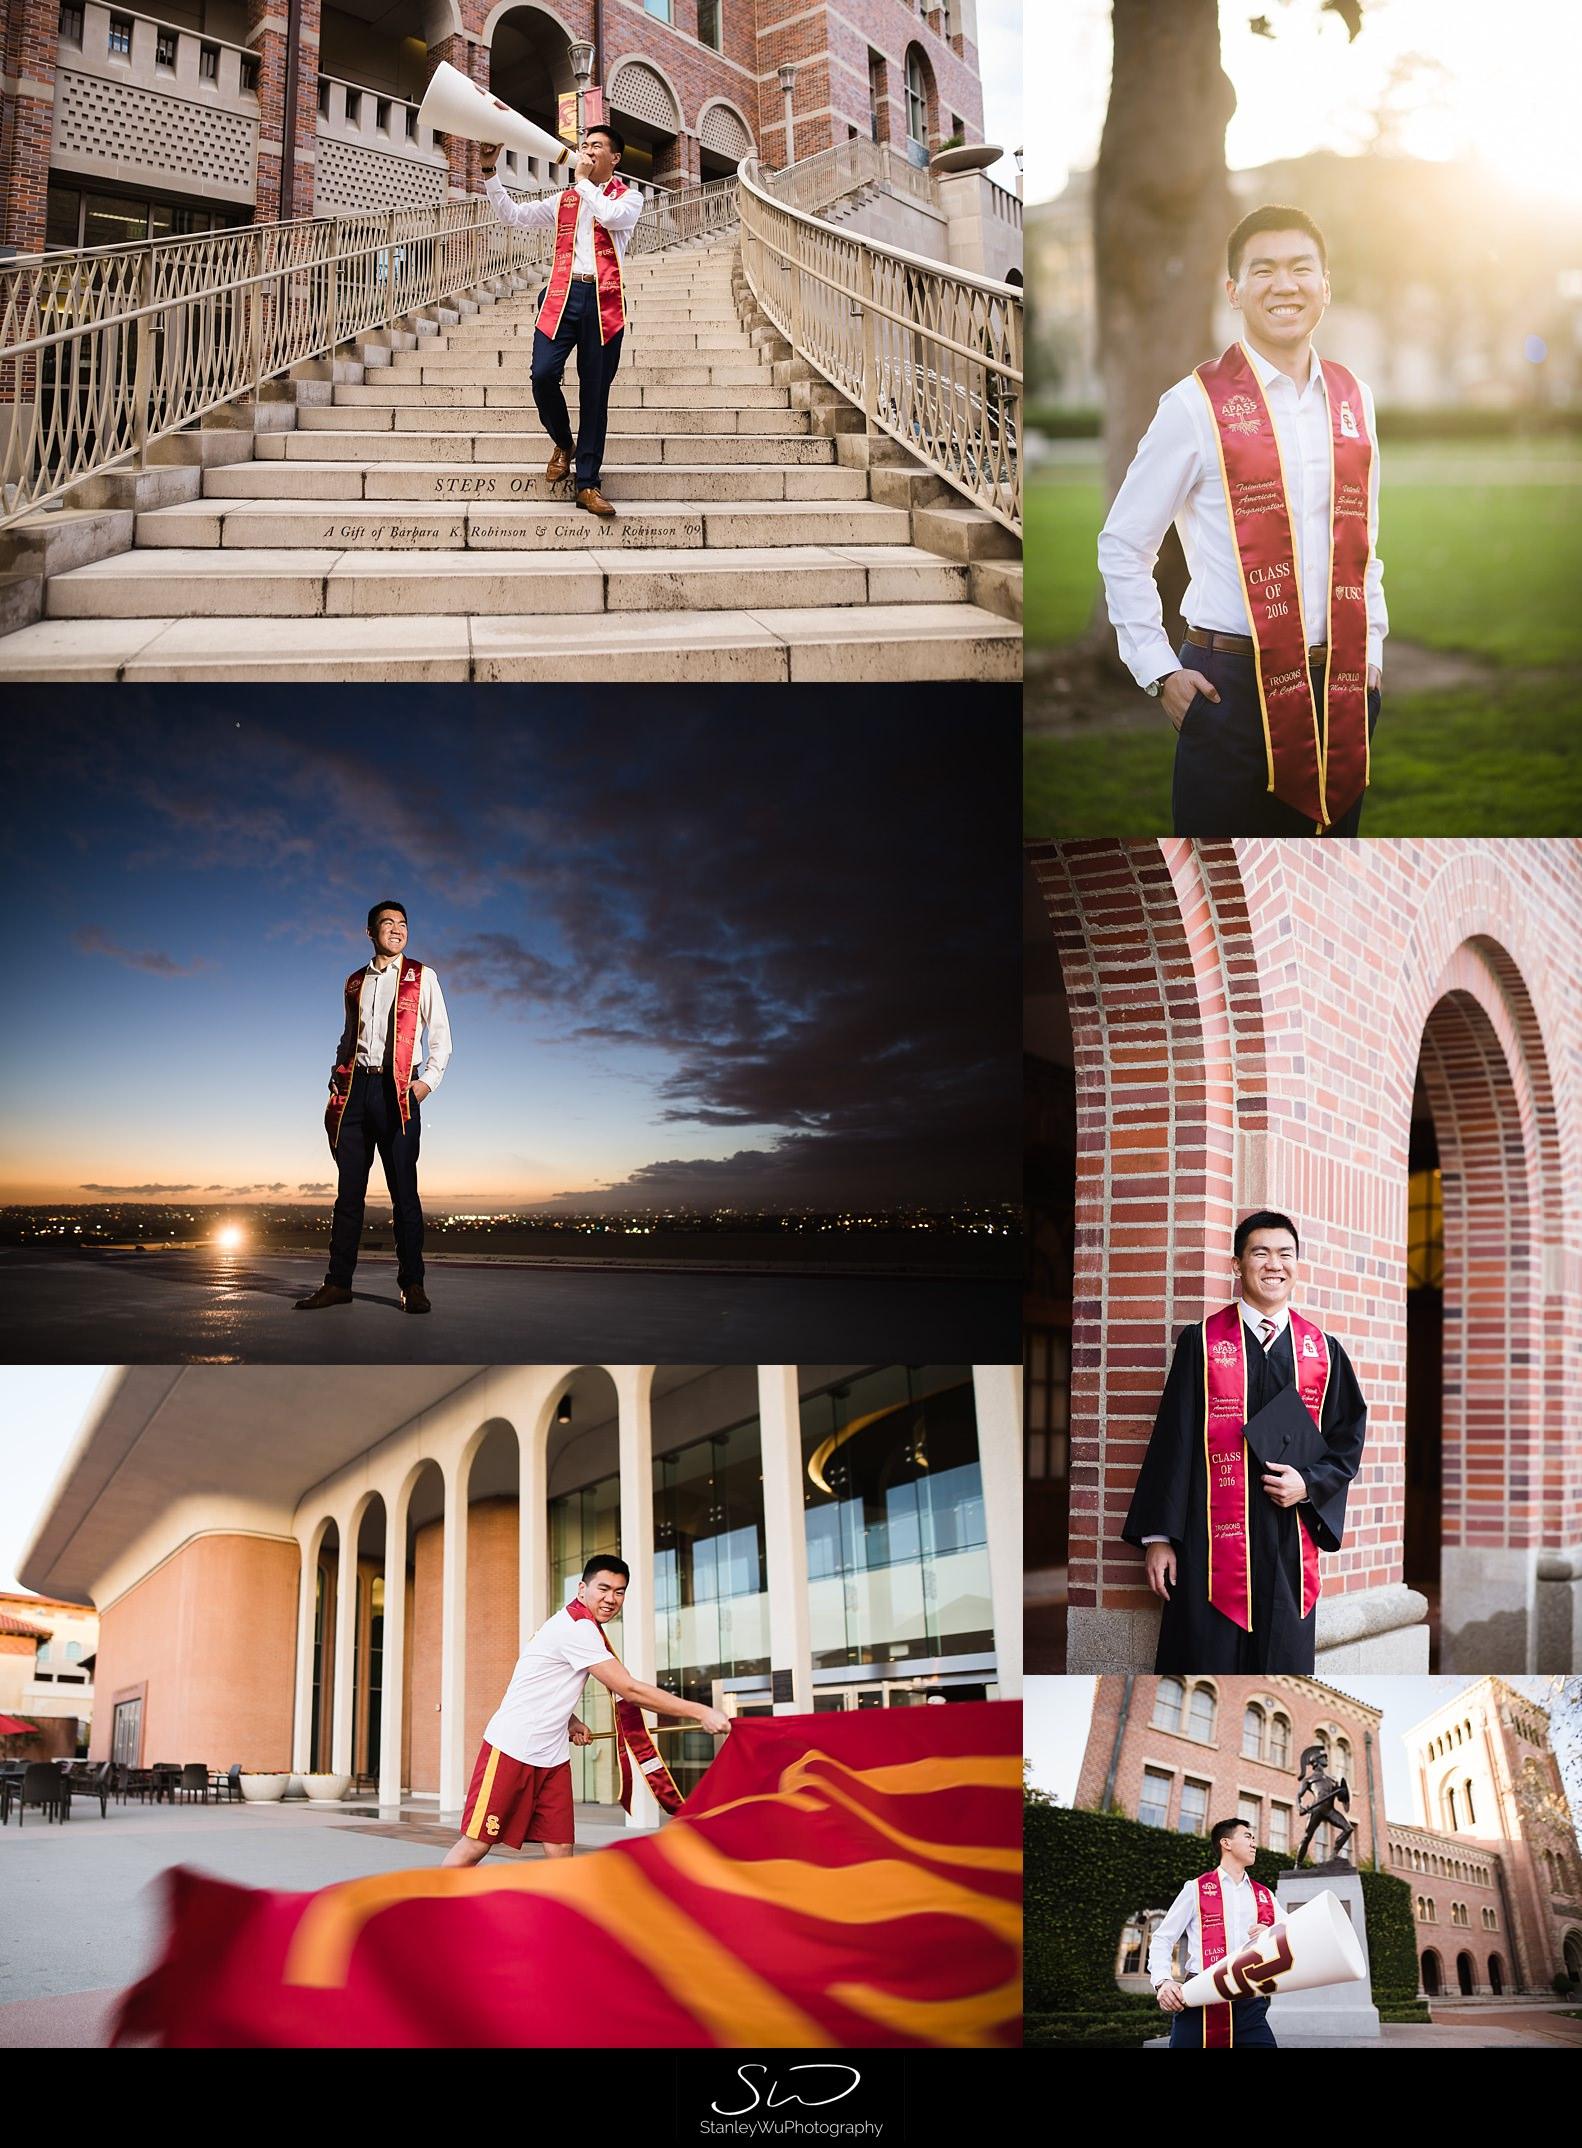 los-angeles-ucla-usc-creative-rooftop-graduation-senior-portraits